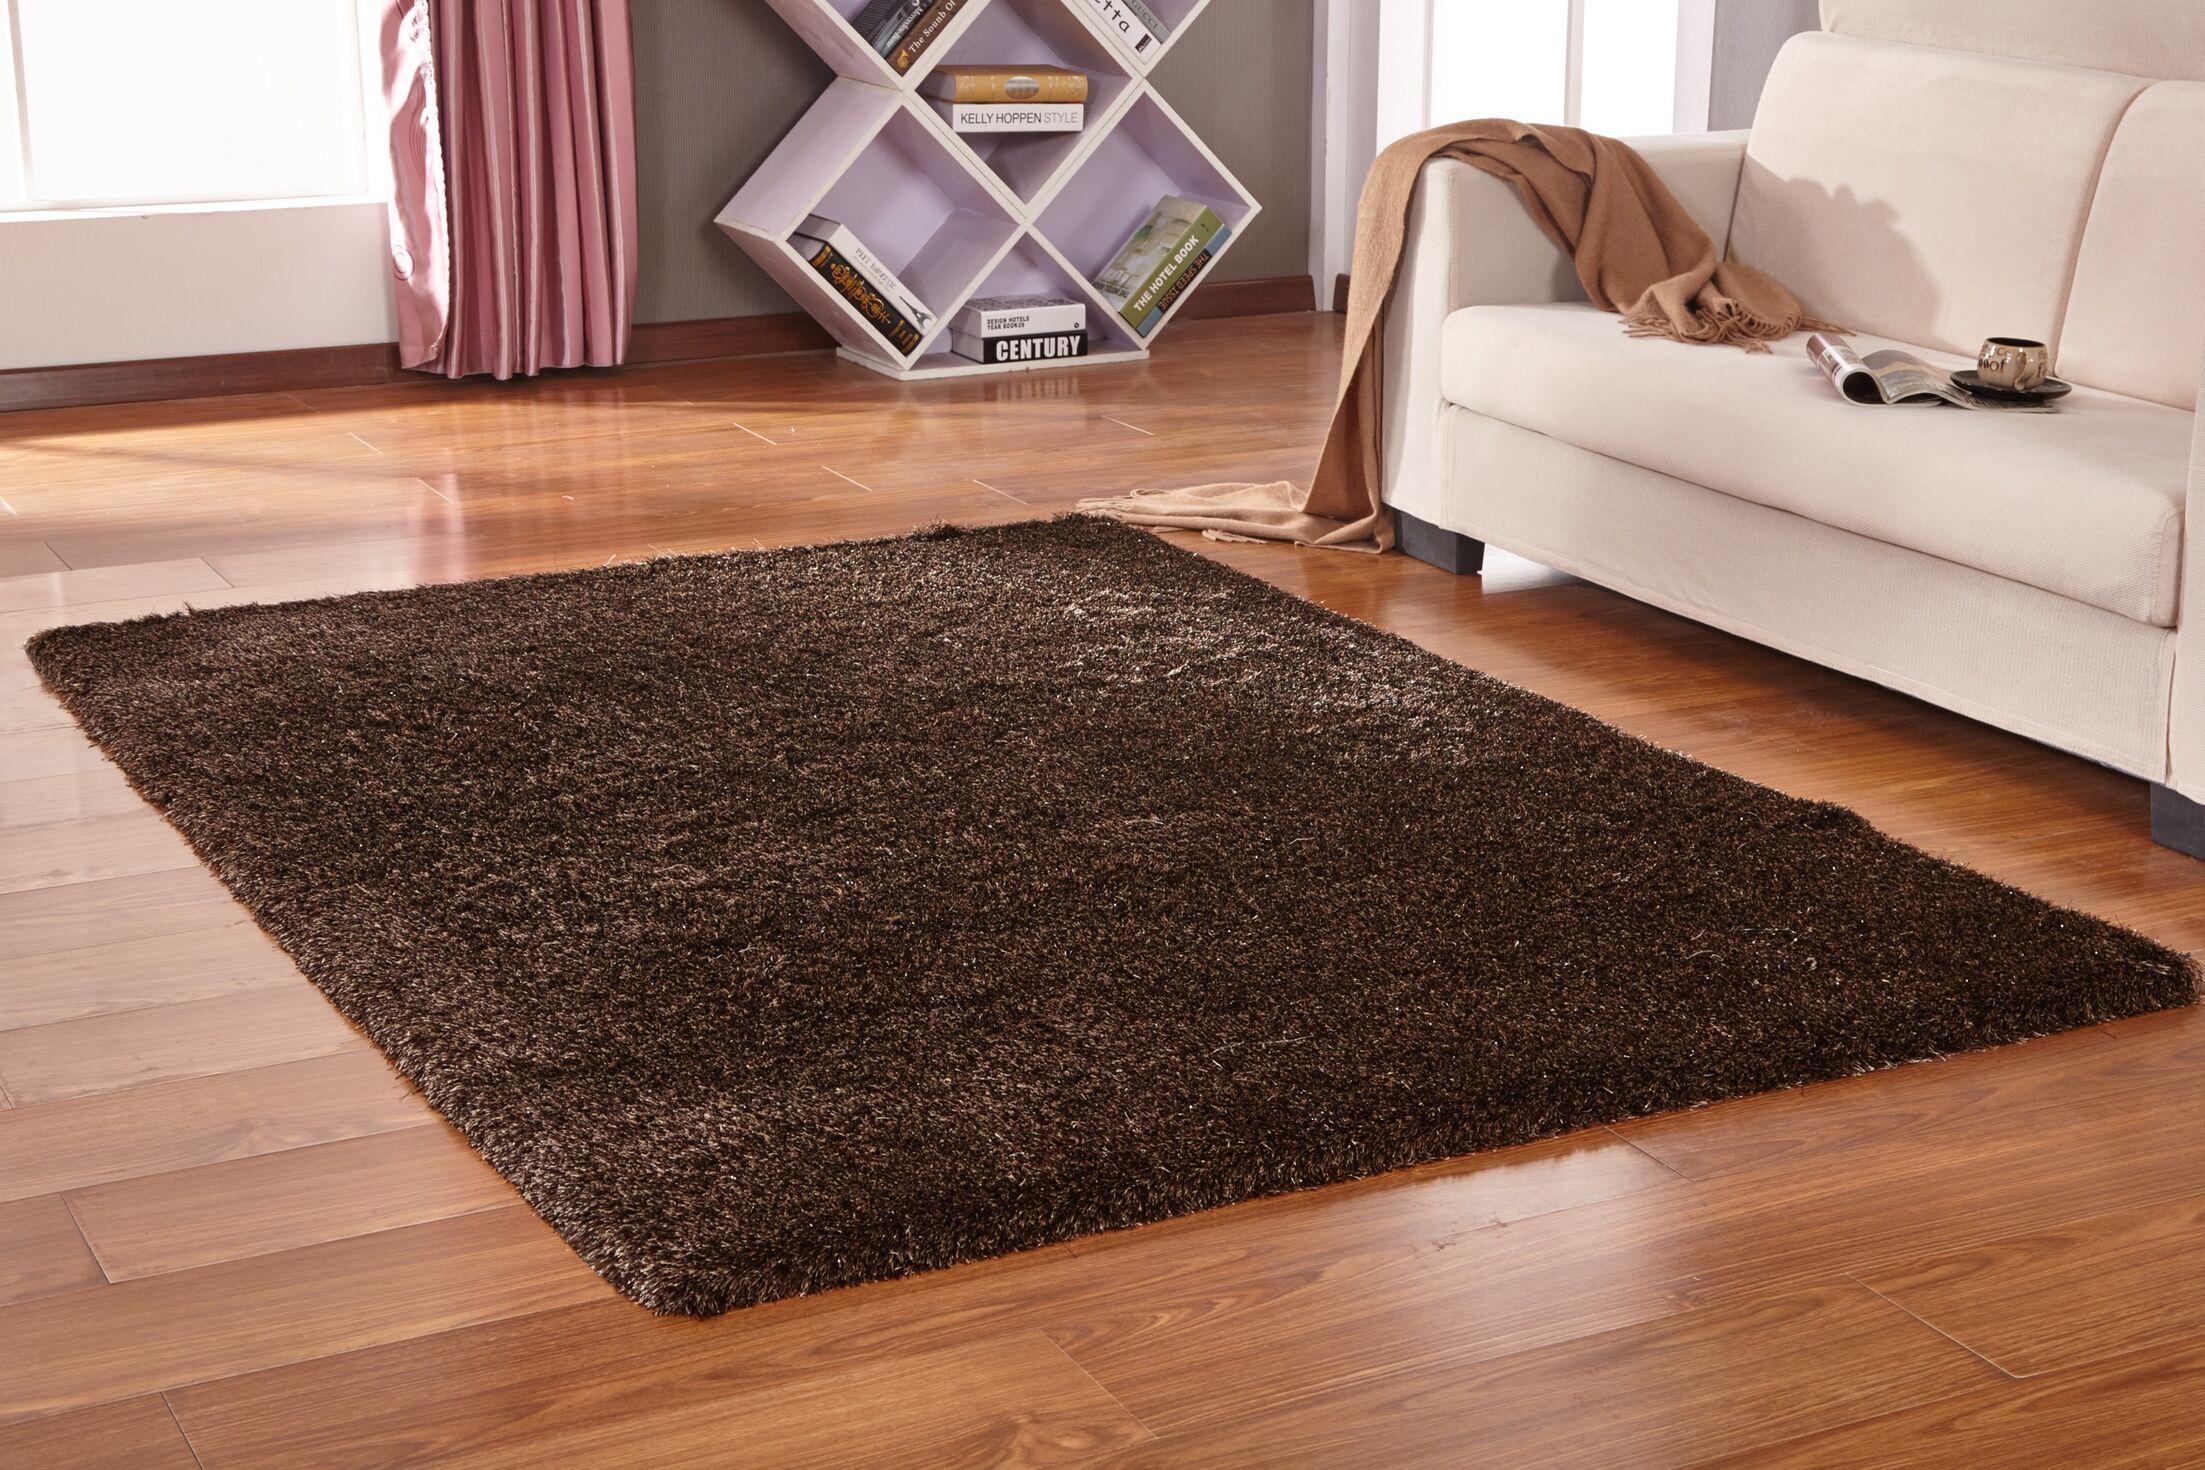 Vinci Hand-Tufted Brown Area Rug Rug Size: Rectangle 5' x 7'